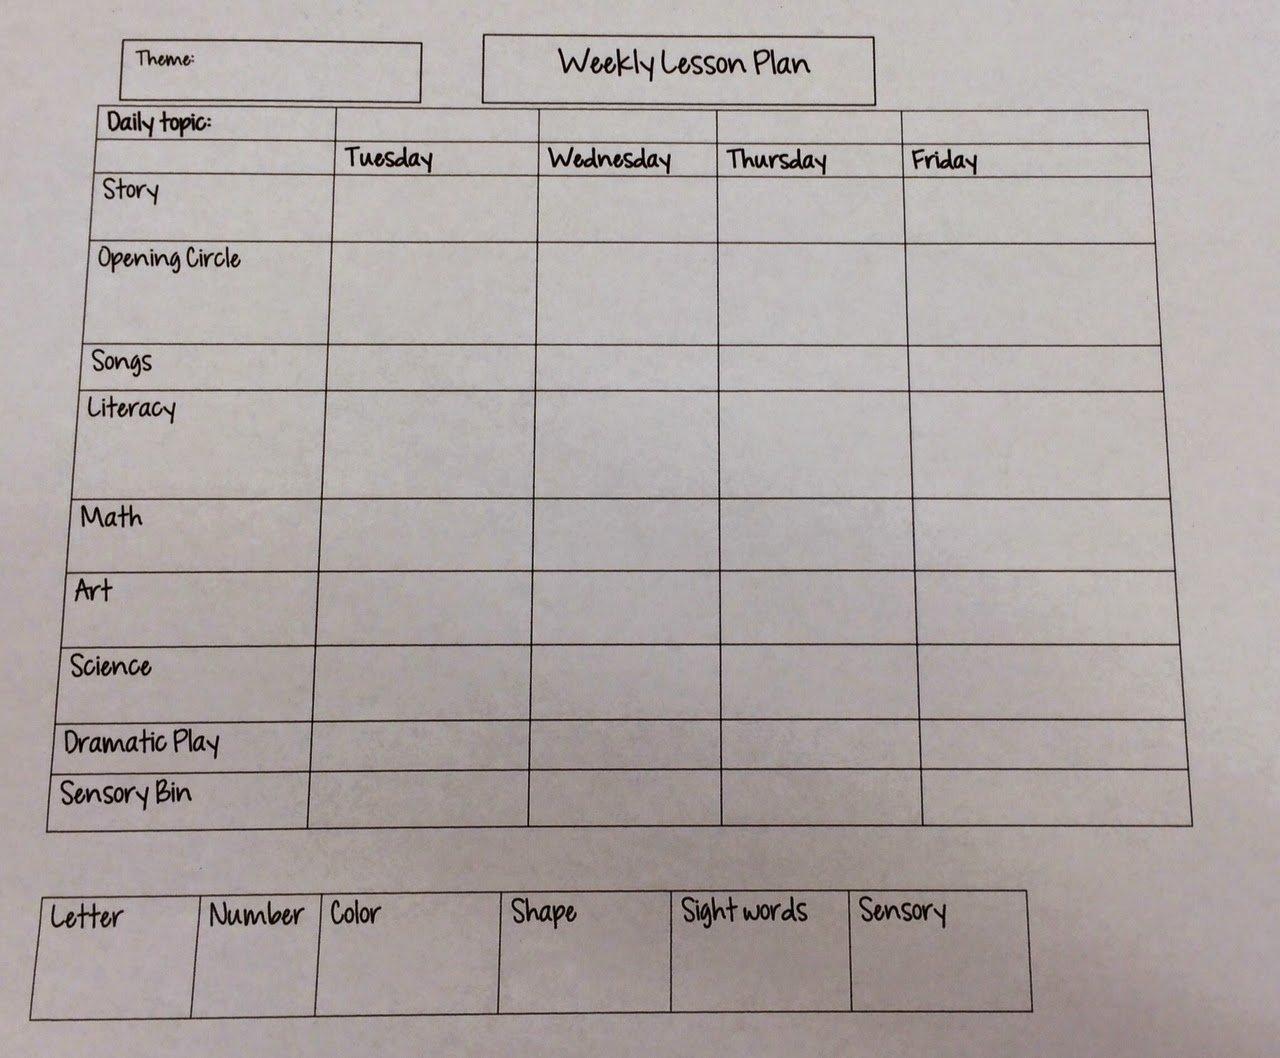 Lesson Plan Template for Preschool Inspirational Miss Nicole S Preschool Weekly Lesson Plan Template